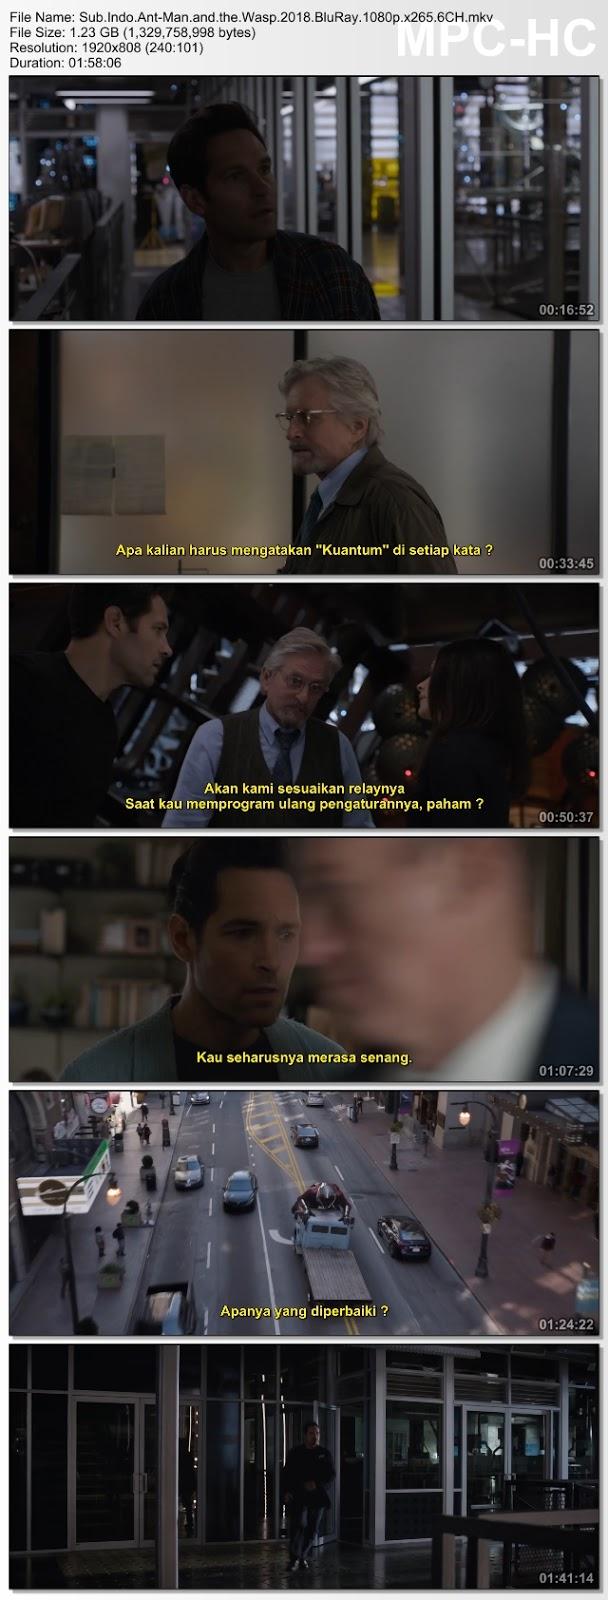 Screenshots Download Homem-Formiga e a Vespa (2018) BluRay 480p & 3GP Subtitle Indonesia